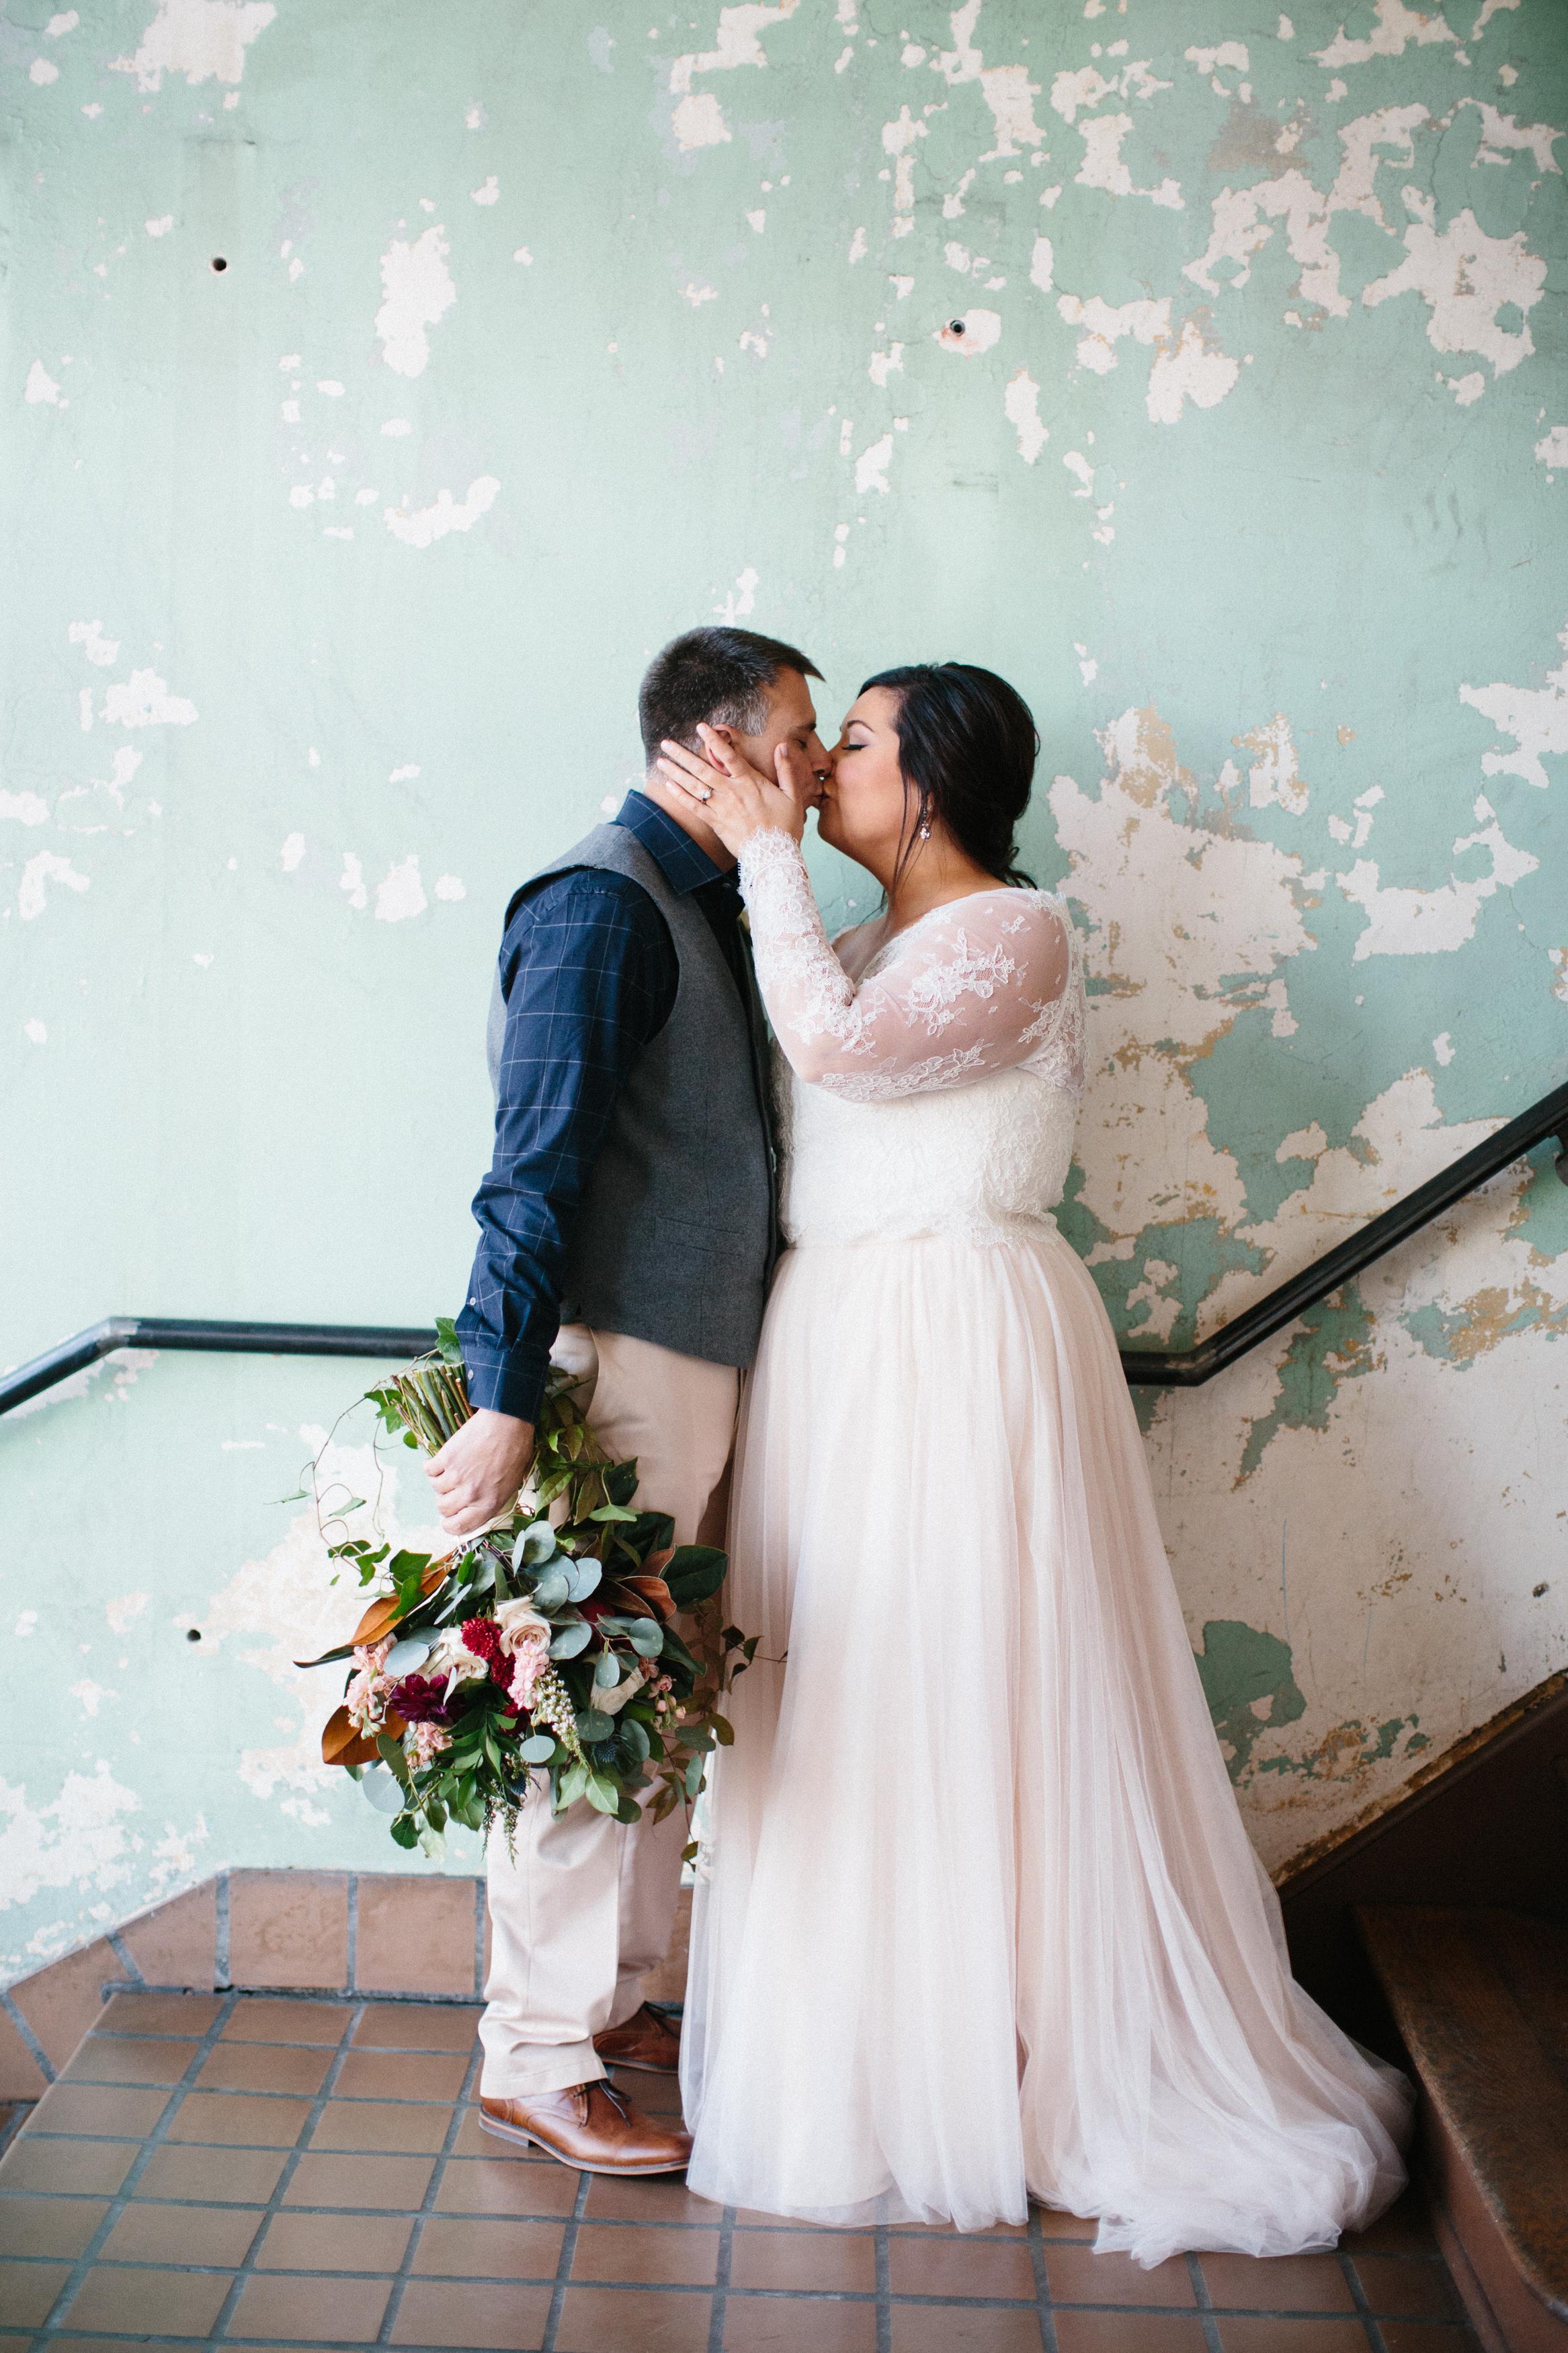 Lauren_Jeremy_Standard_Wedding_Knoxville_Abigail_Malone_Photography_FIlm-270.jpg